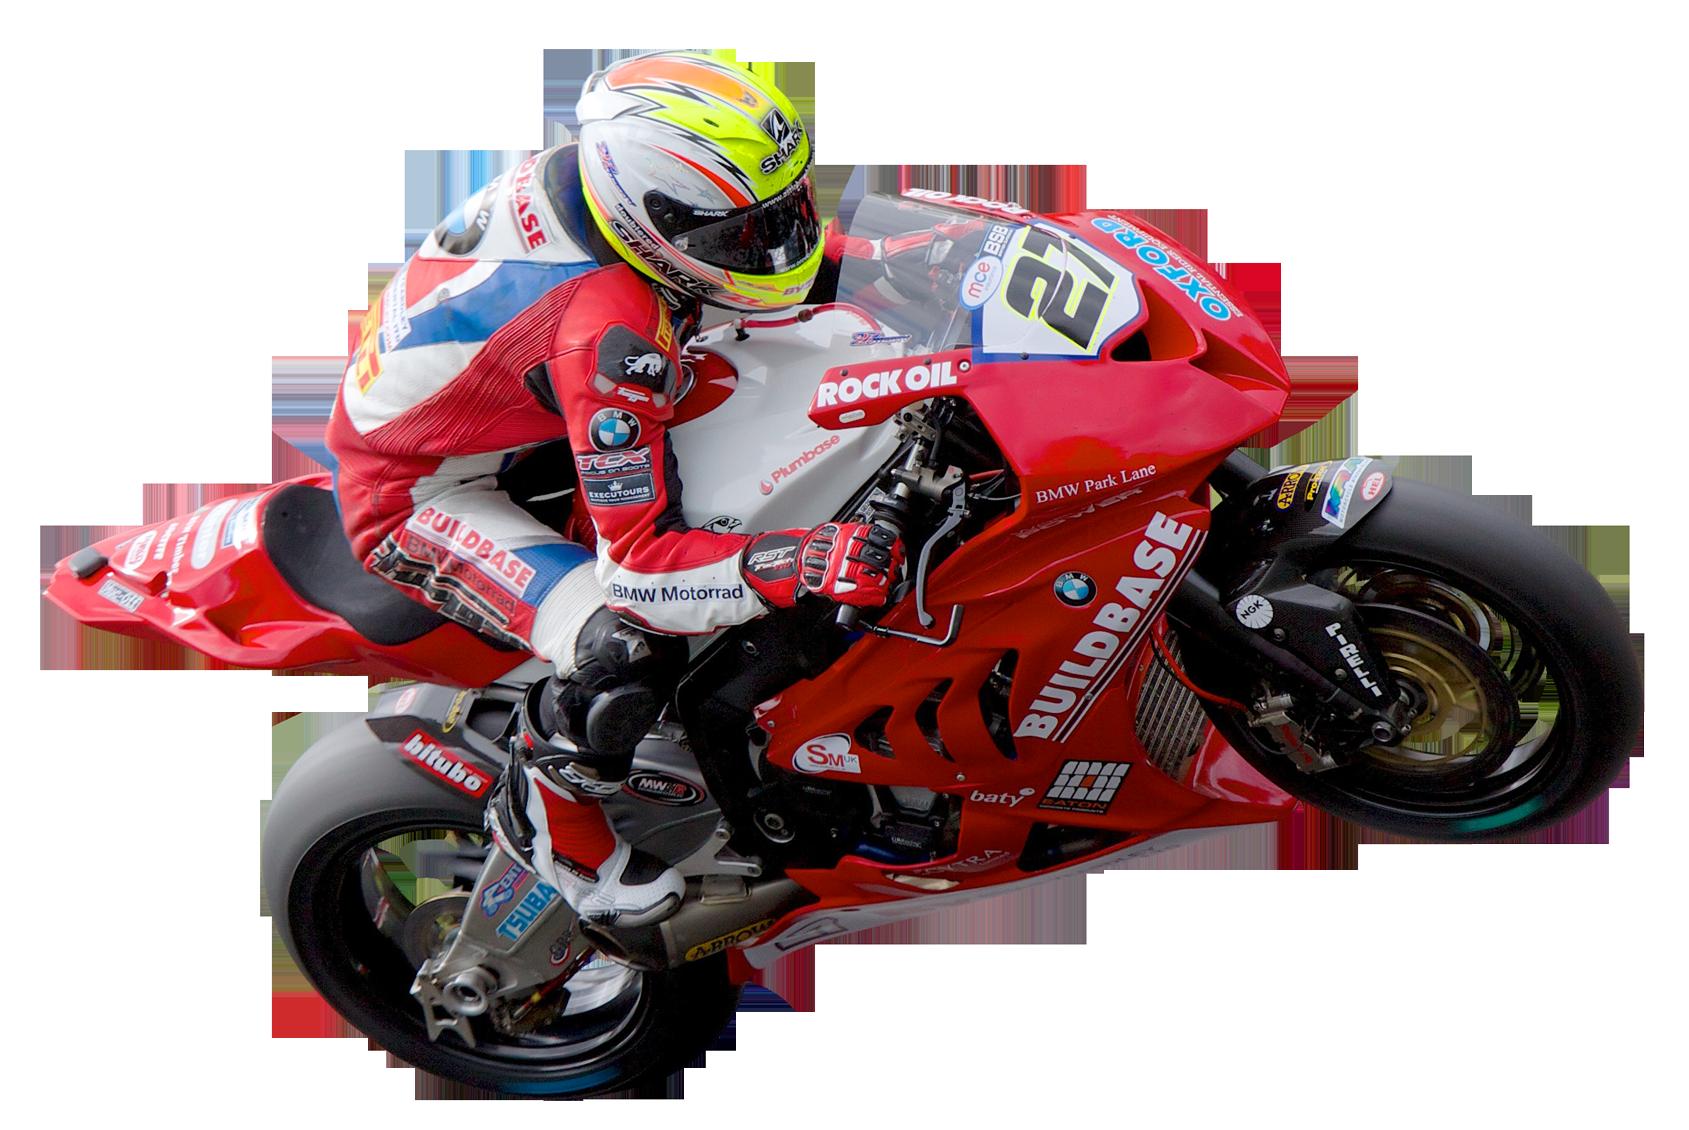 Png Motorbike Transparent Motorbike Png Images Pluspng